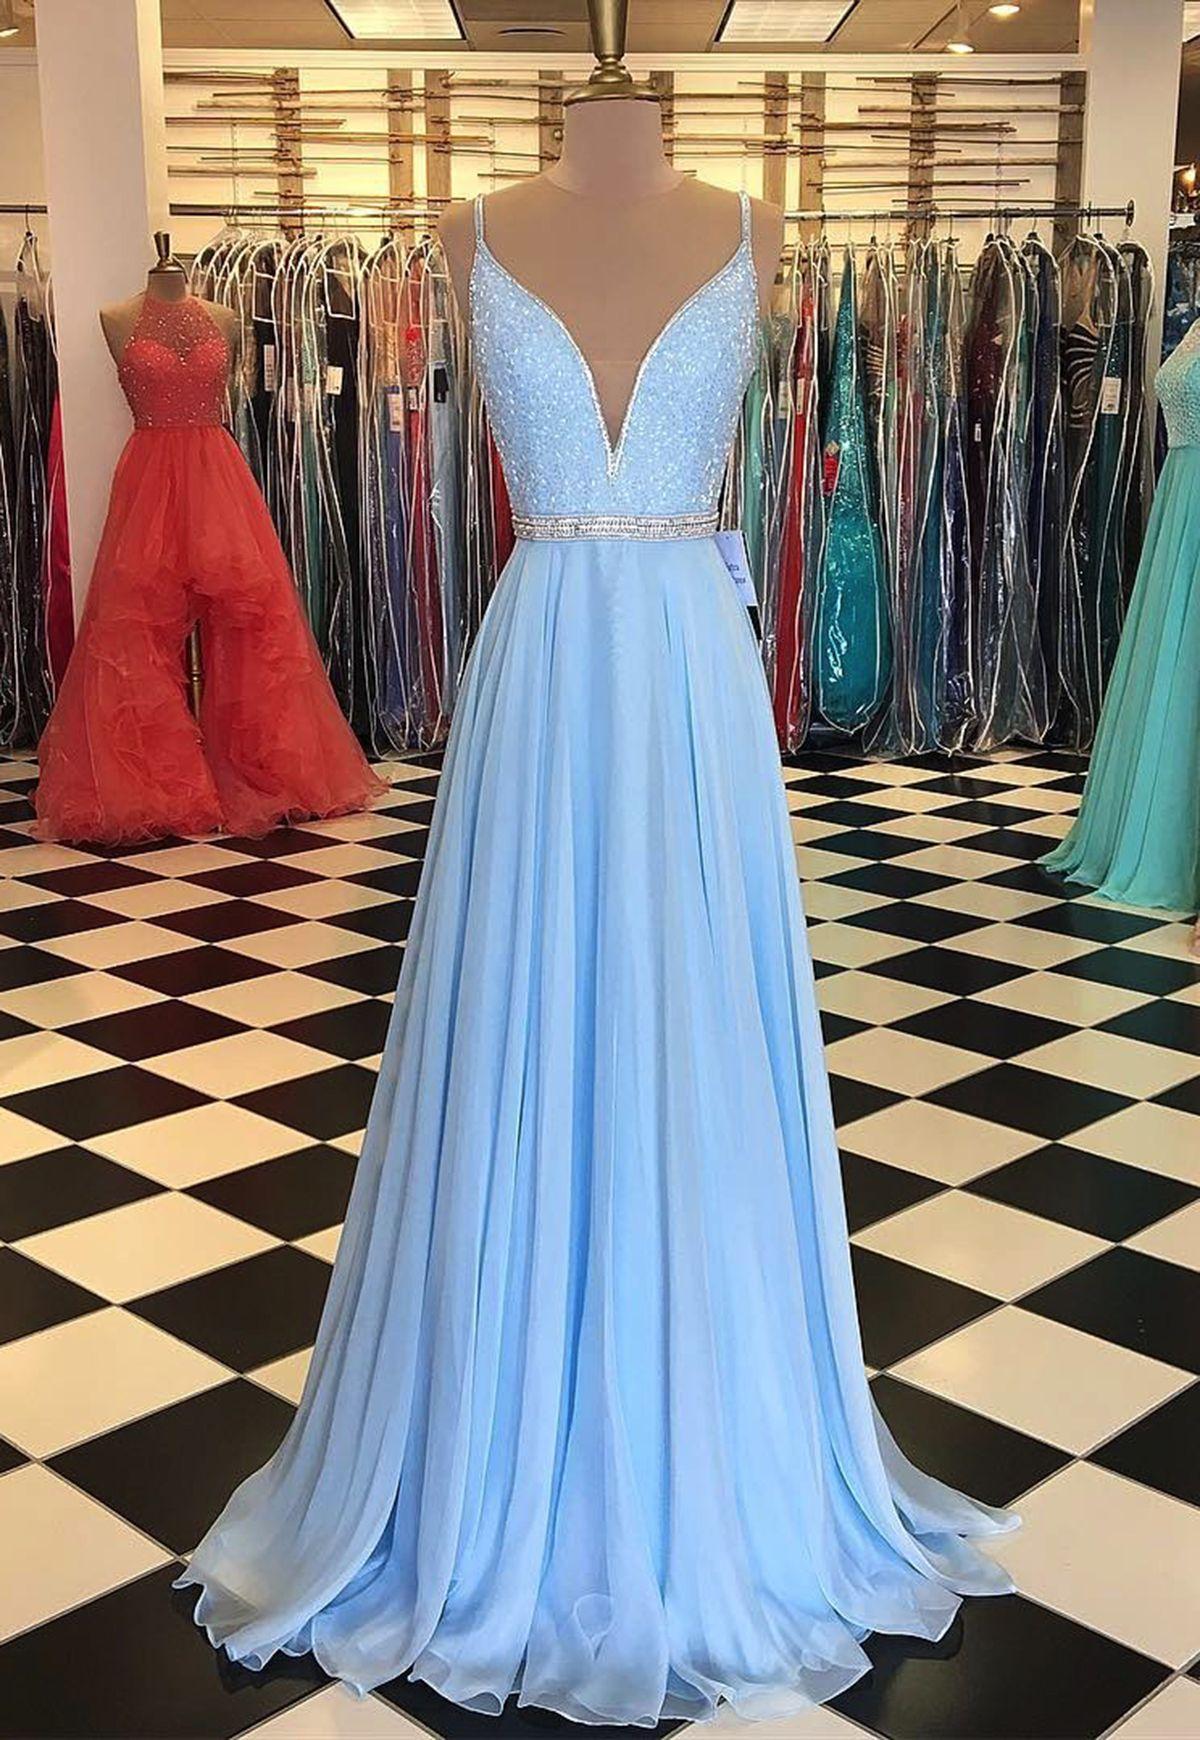 Sparkly baby blue chiffon prom dress with straps promdress